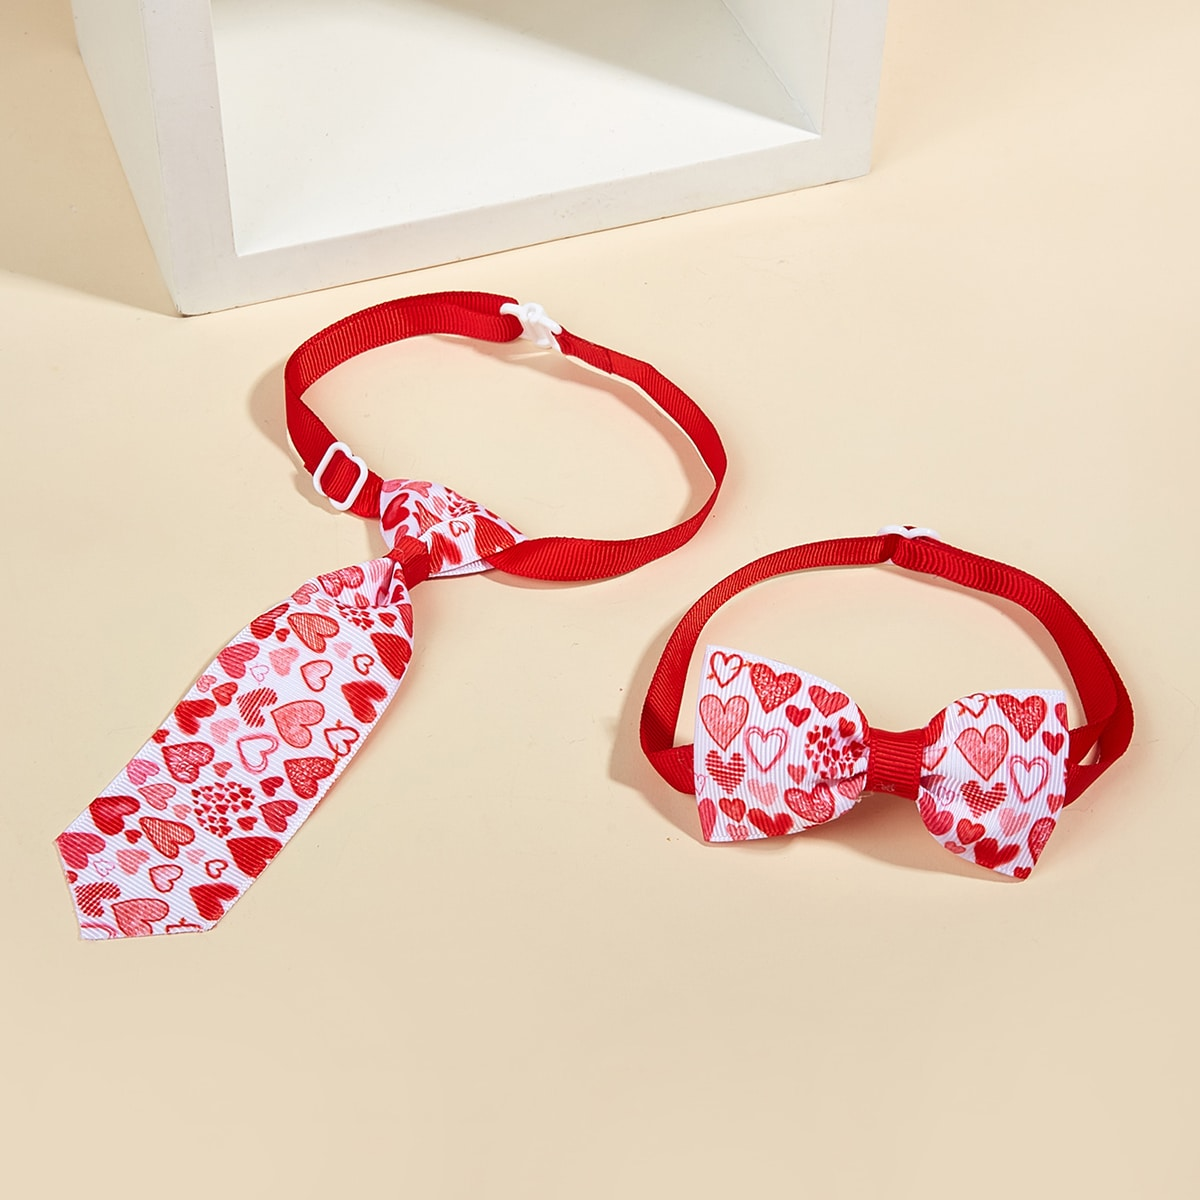 2 Stücke Haustier Schleife mit Herzen Muster & Krawatte Set